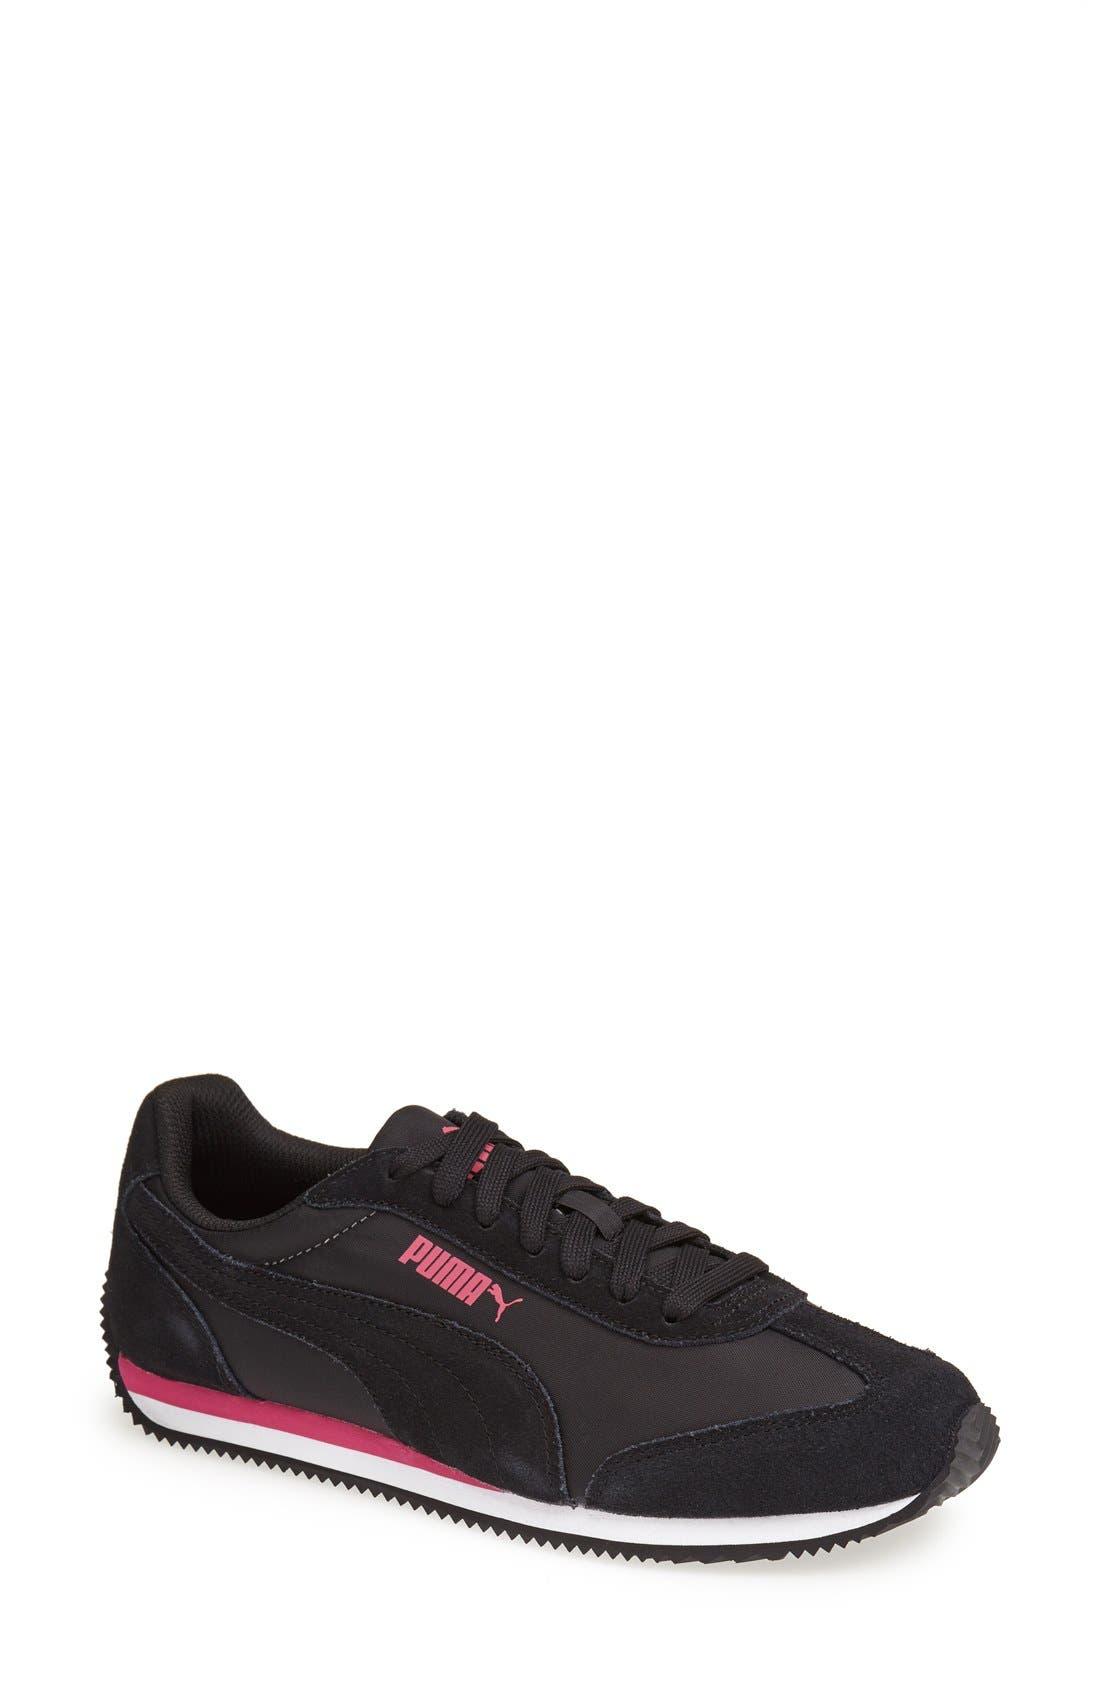 Main Image - PUMA 'Rio Speed NL' Sneaker (Women)